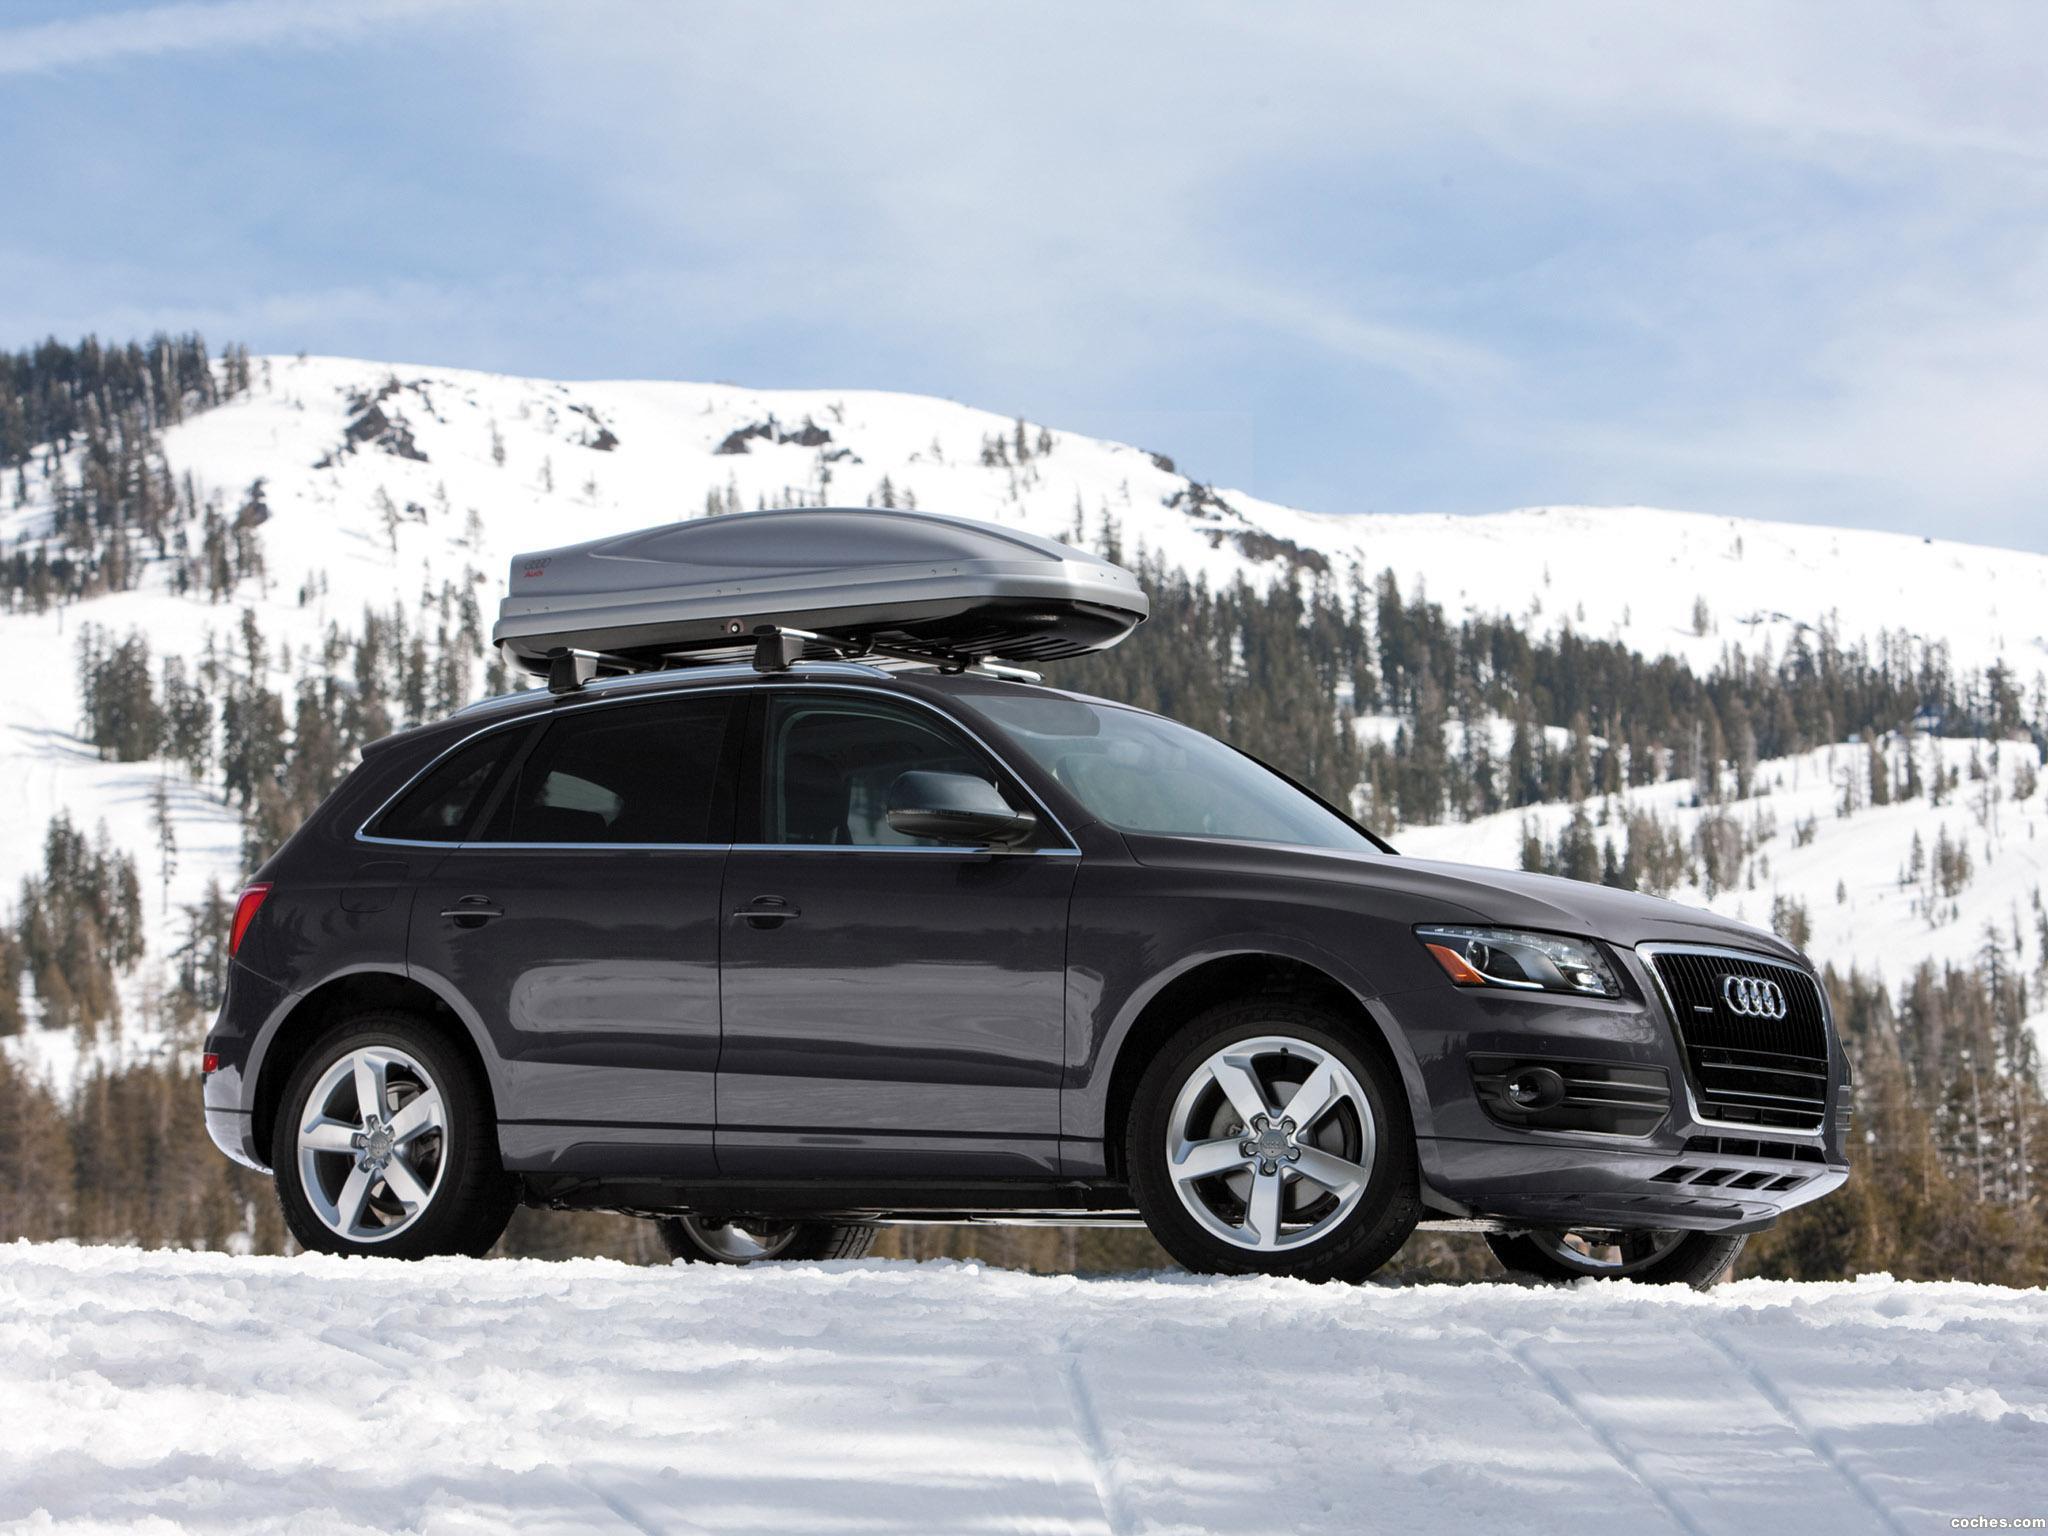 Foto 11 de Audi Q5 3.2 Quattro USA 2009